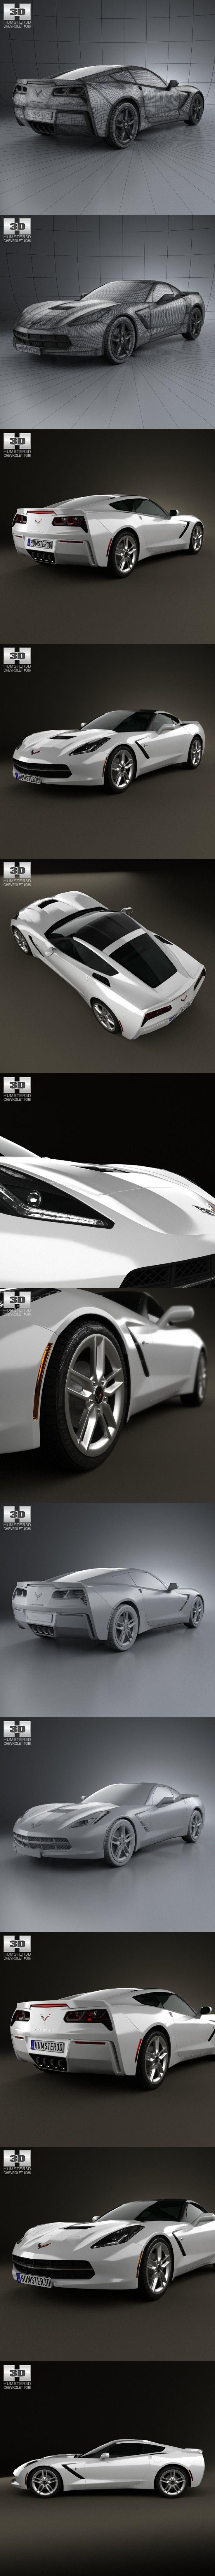 Chevrolet Corvette Stingray 2014 #chevrolet #chevroletcorvette